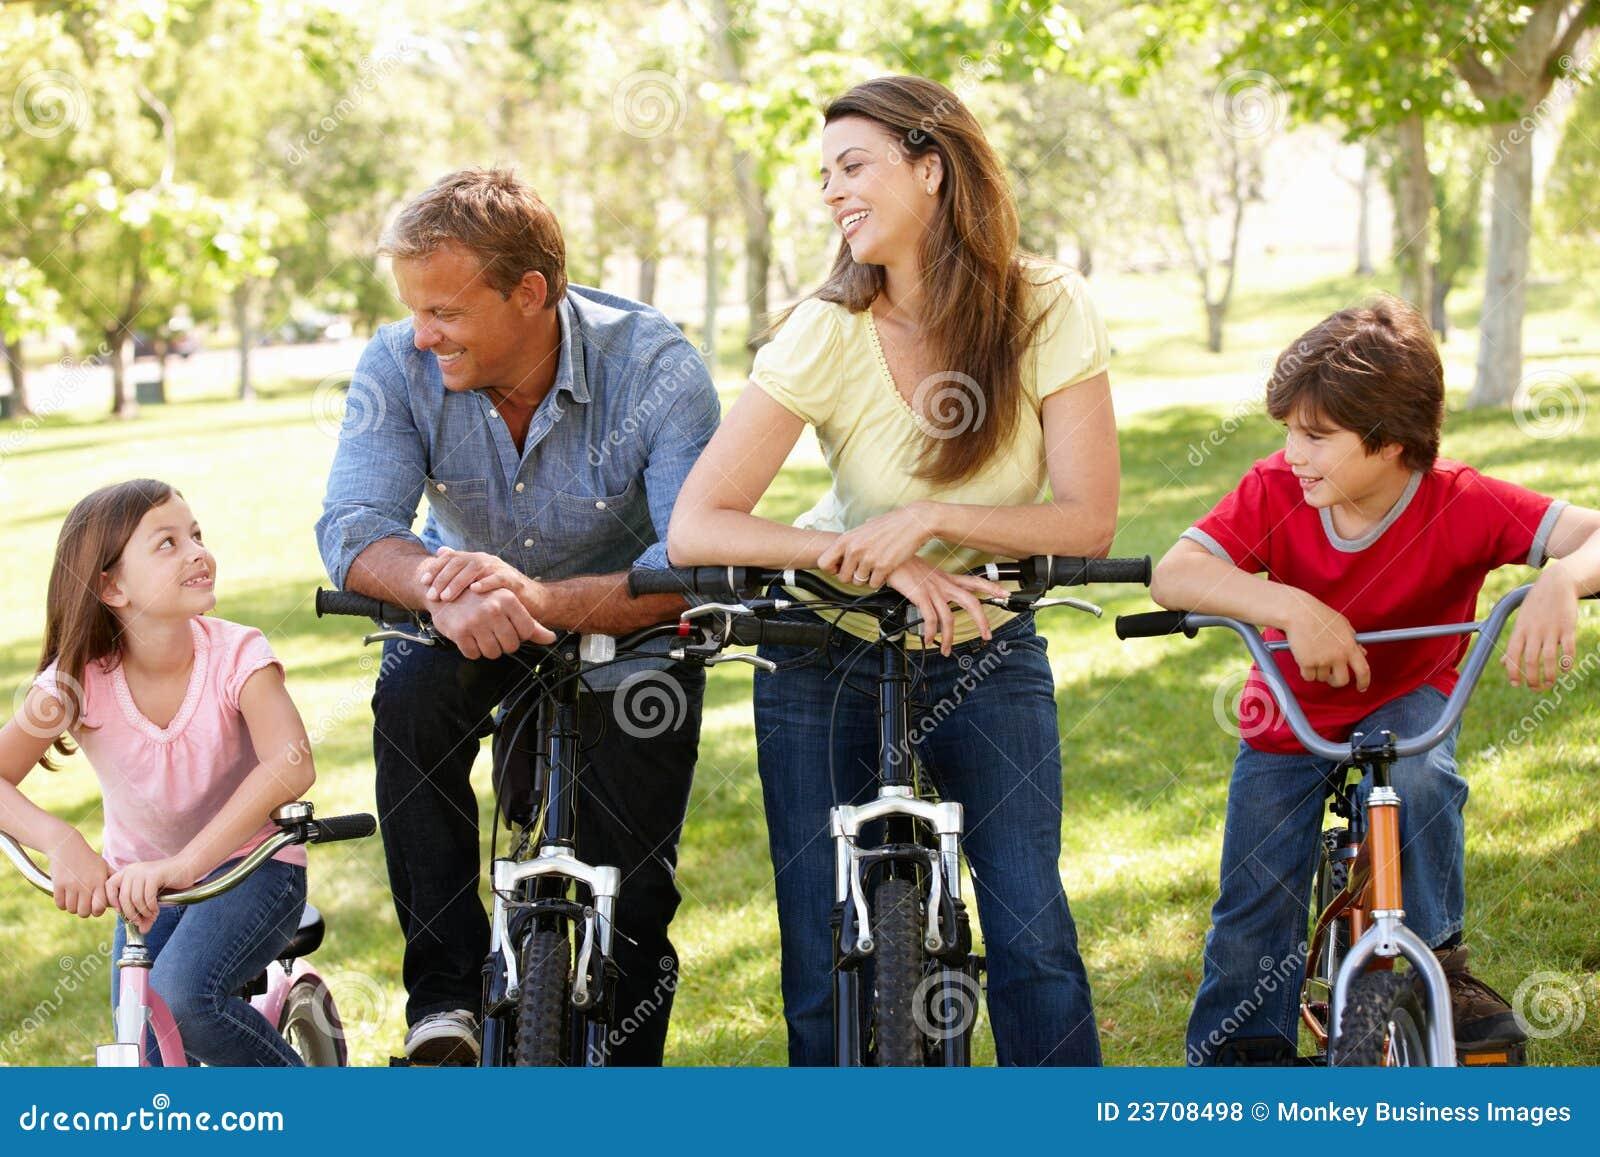 Испанская семья на bikes в парке